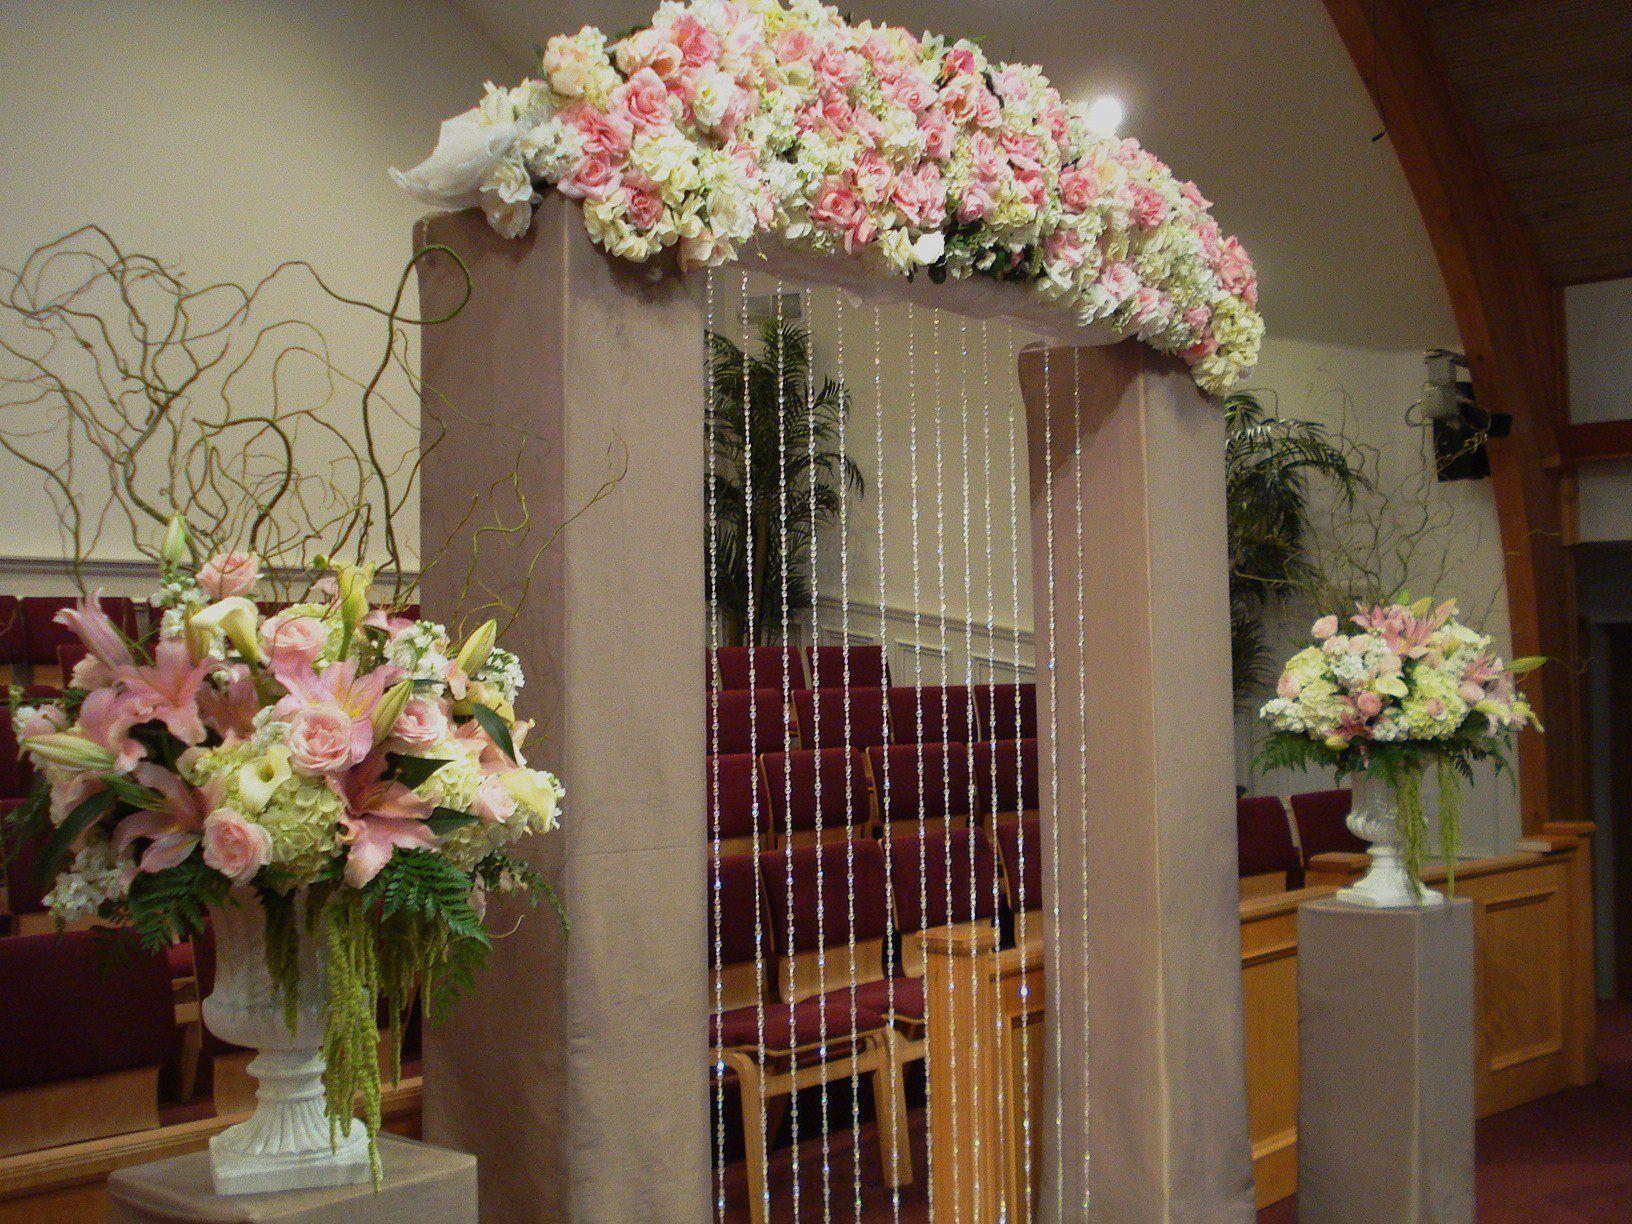 Pink wedding flowers ceremony flowers church indoor decor in white pink wedding flowers ceremony flowers church indoor decor in white urns httpsophisticatedfloral junglespirit Choice Image